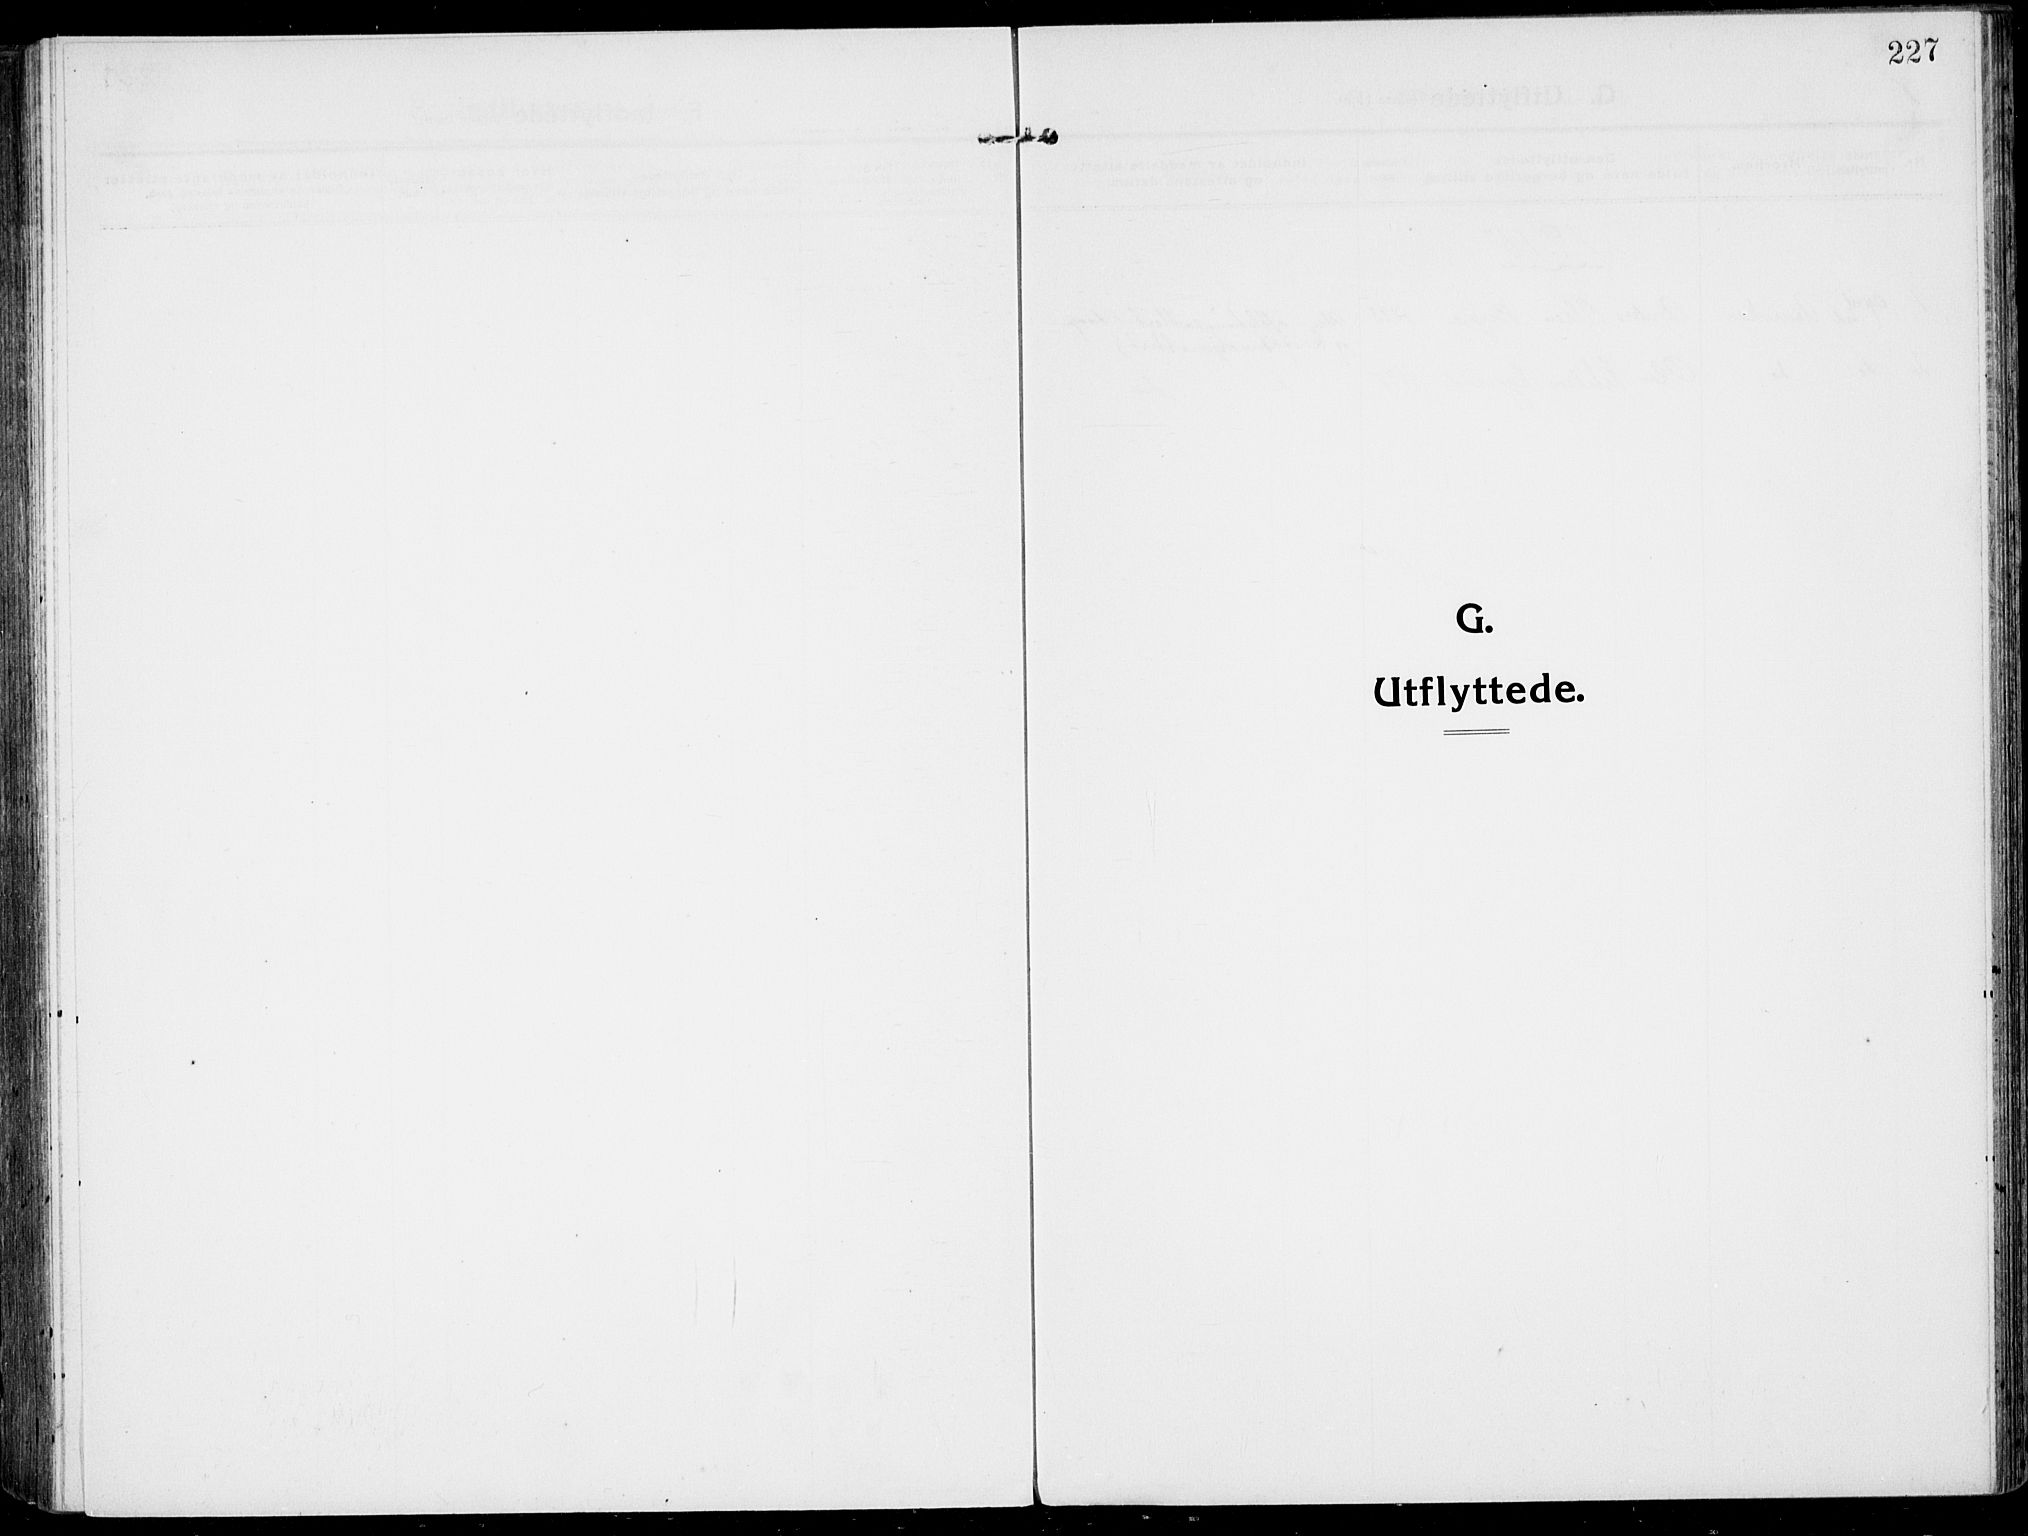 SAKO, Rjukan kirkebøker, F/Fa/L0002: Ministerialbok nr. 2, 1912-1917, s. 227